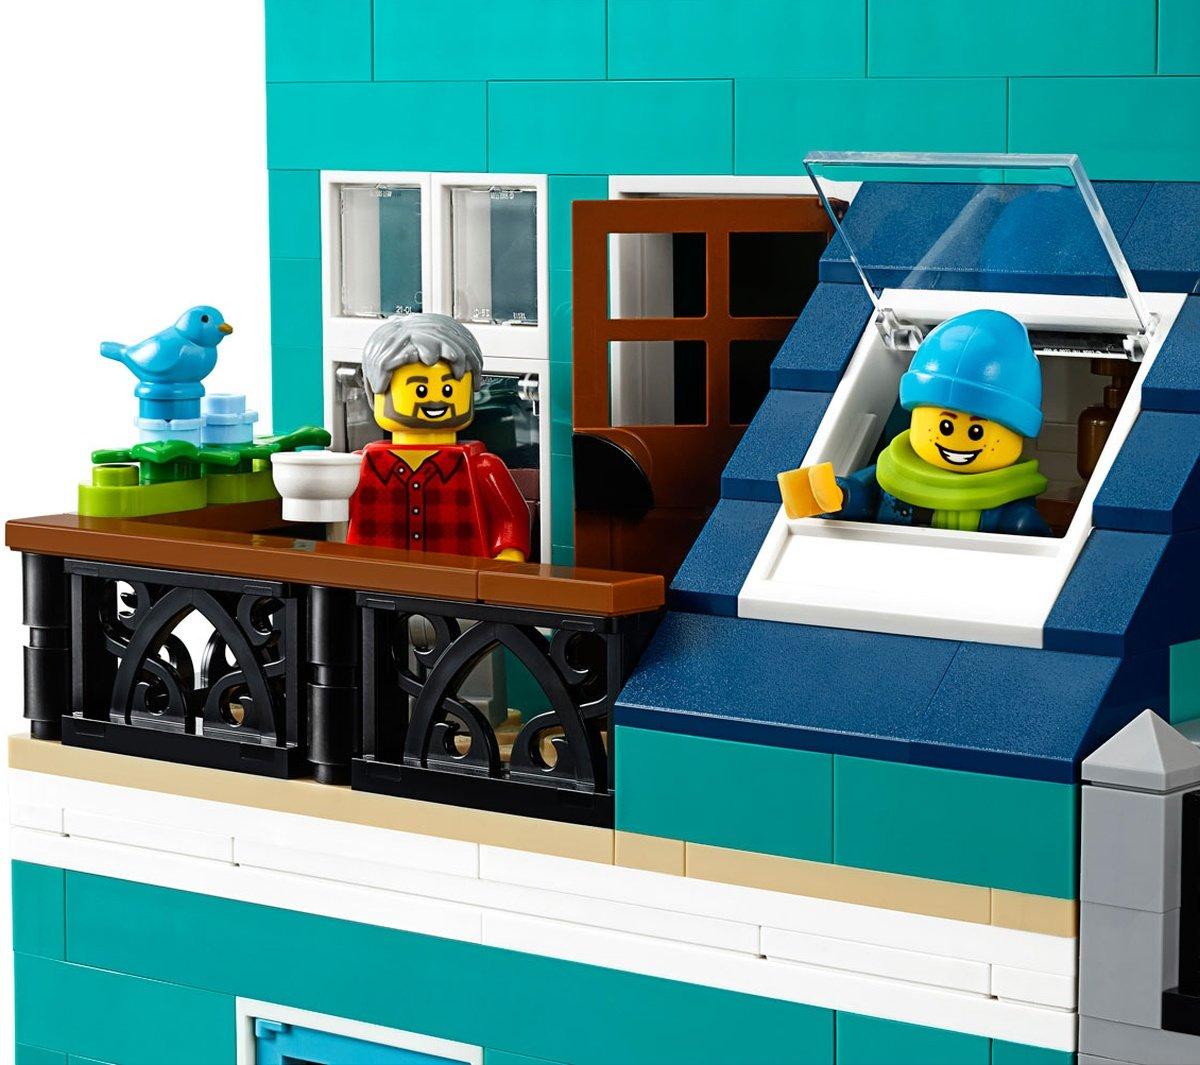 LEGO 10270 Creator Expert Modular Bookshop rooftop